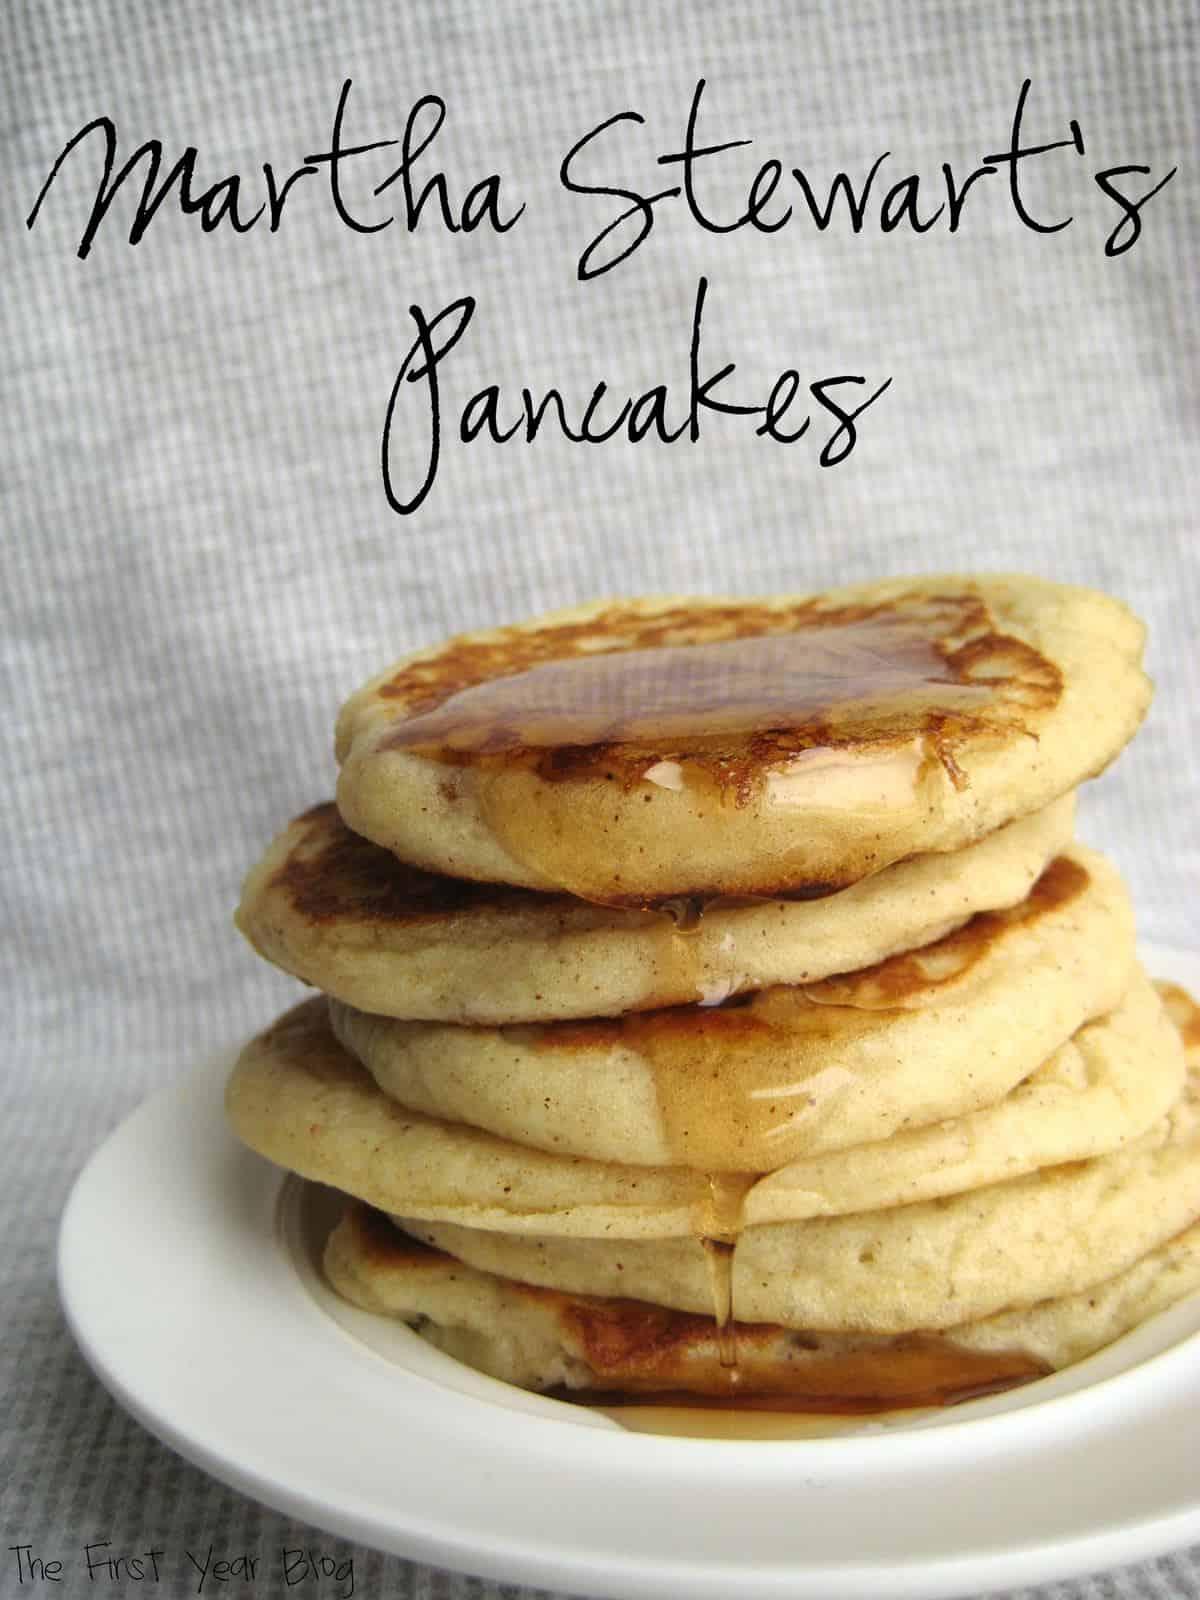 Martha Stewart's Pancakes | The First Year